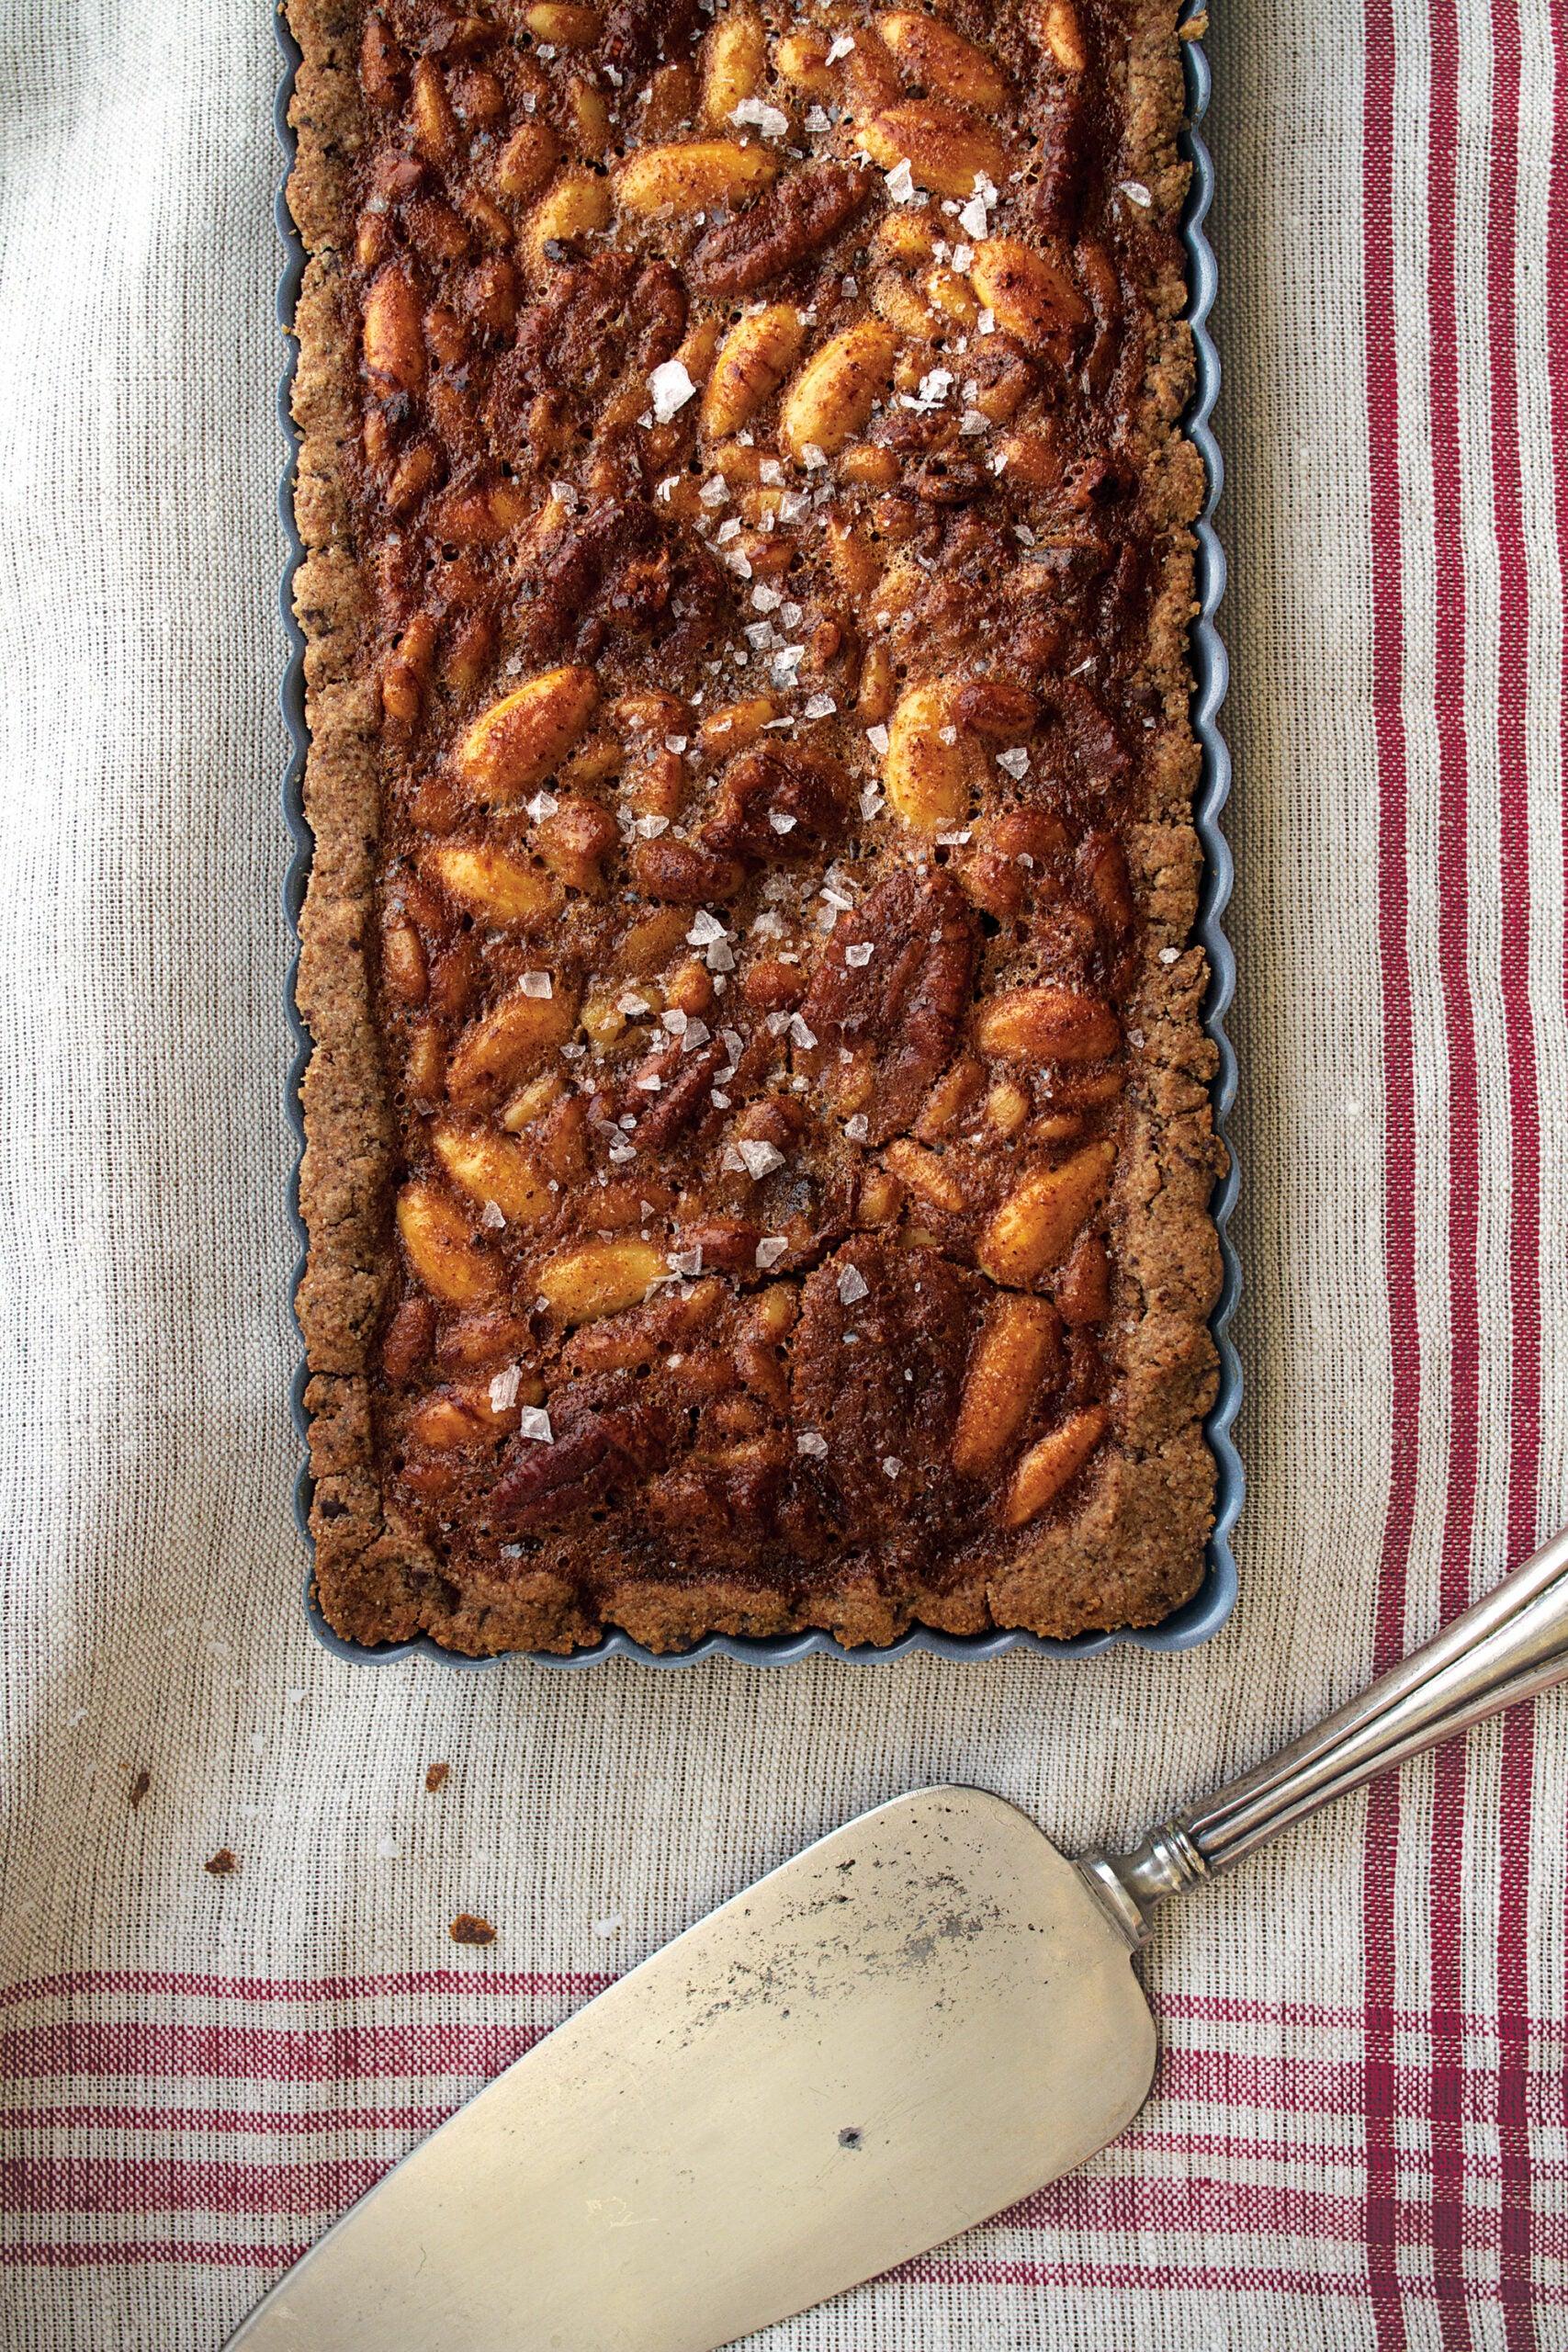 Honey-Nut Tart with Chocolate Rye Crust, Late Winter Feast